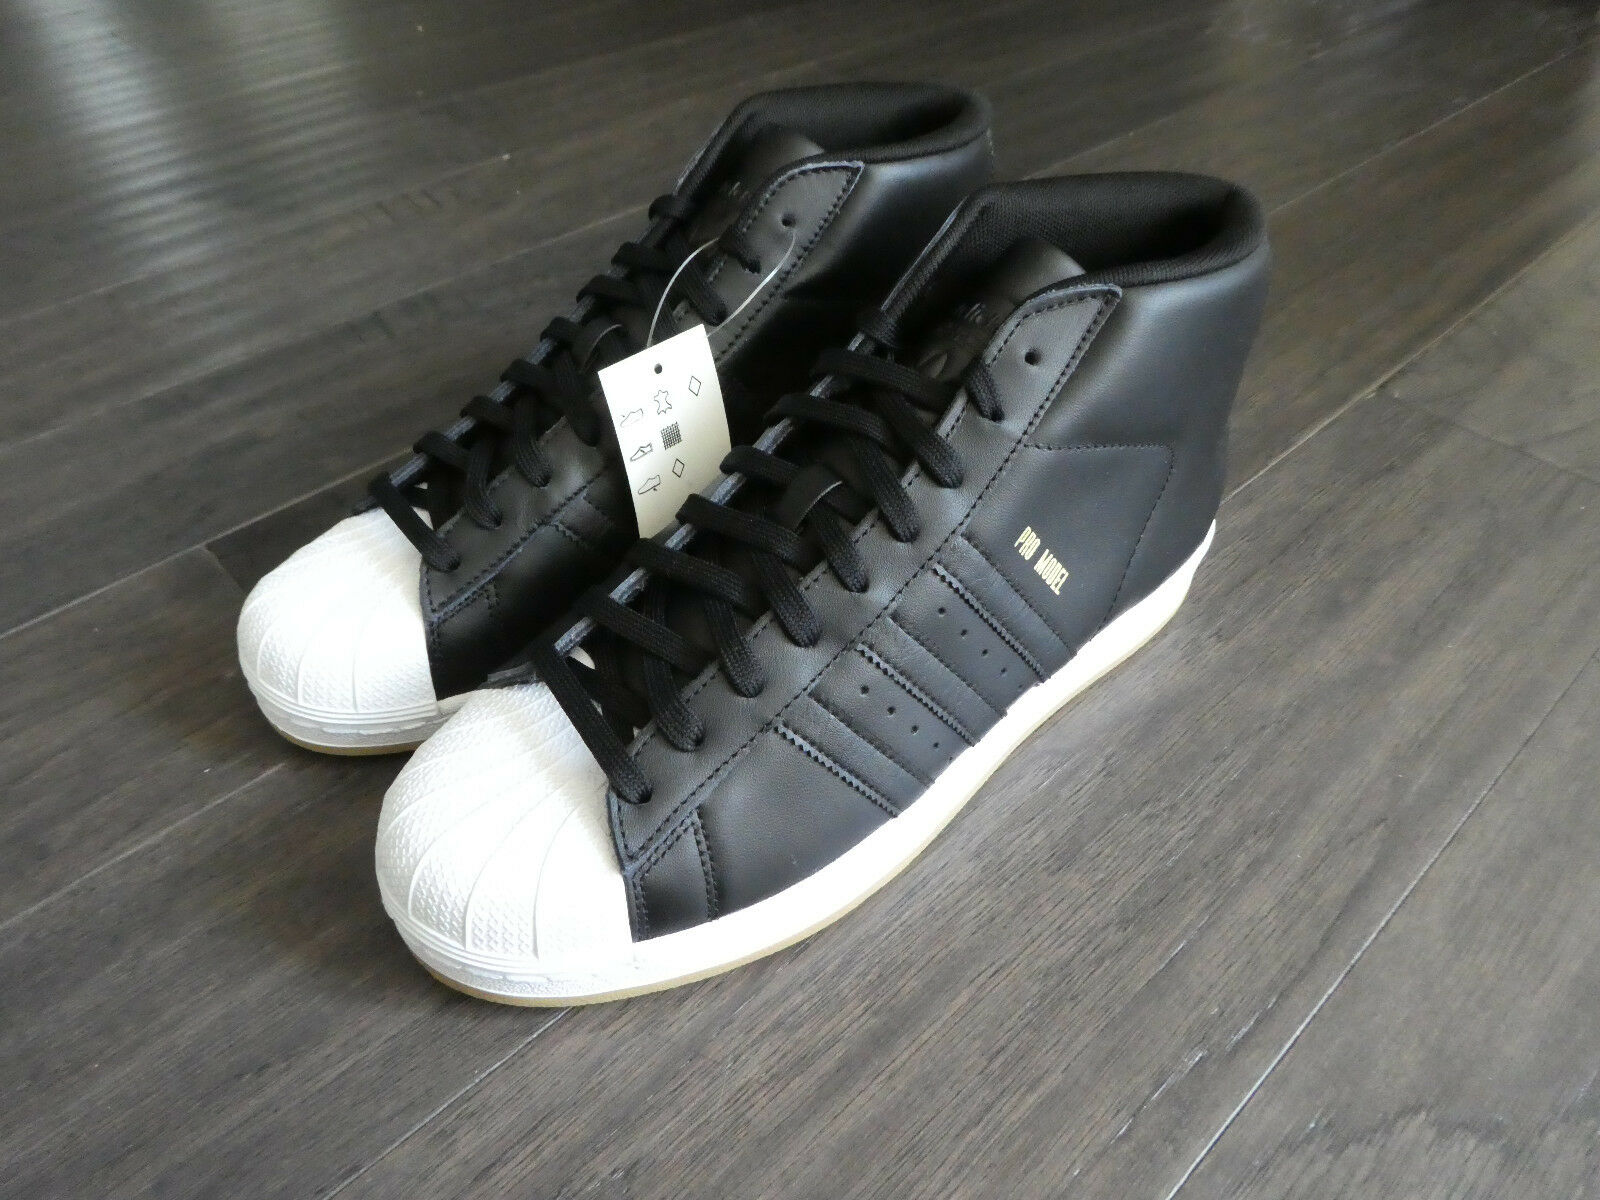 Adidas Pro Model Shelltoe shoes men's new CQ7 black gum sneakers